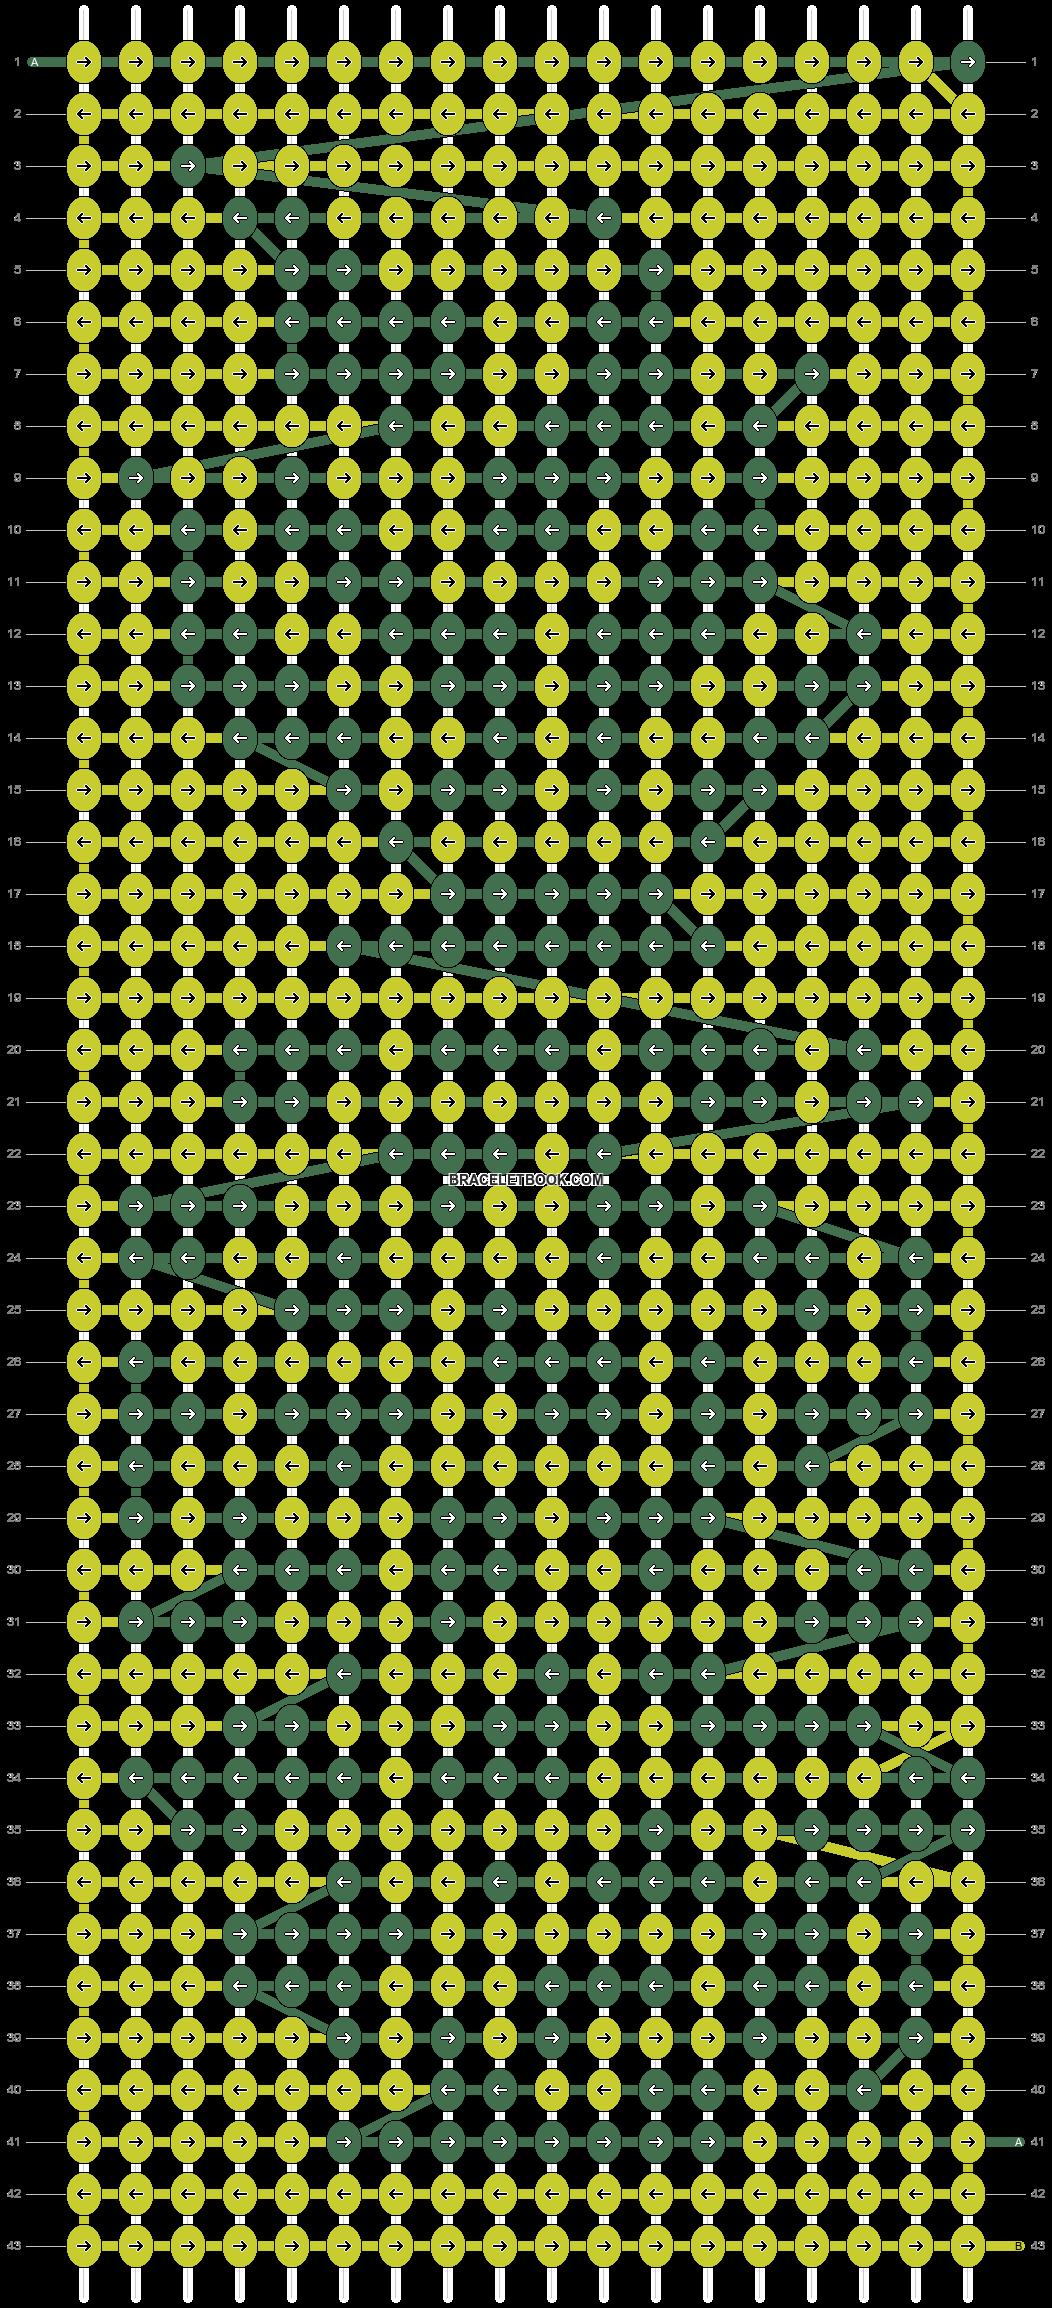 Alpha Pattern #21965 added by N0P3